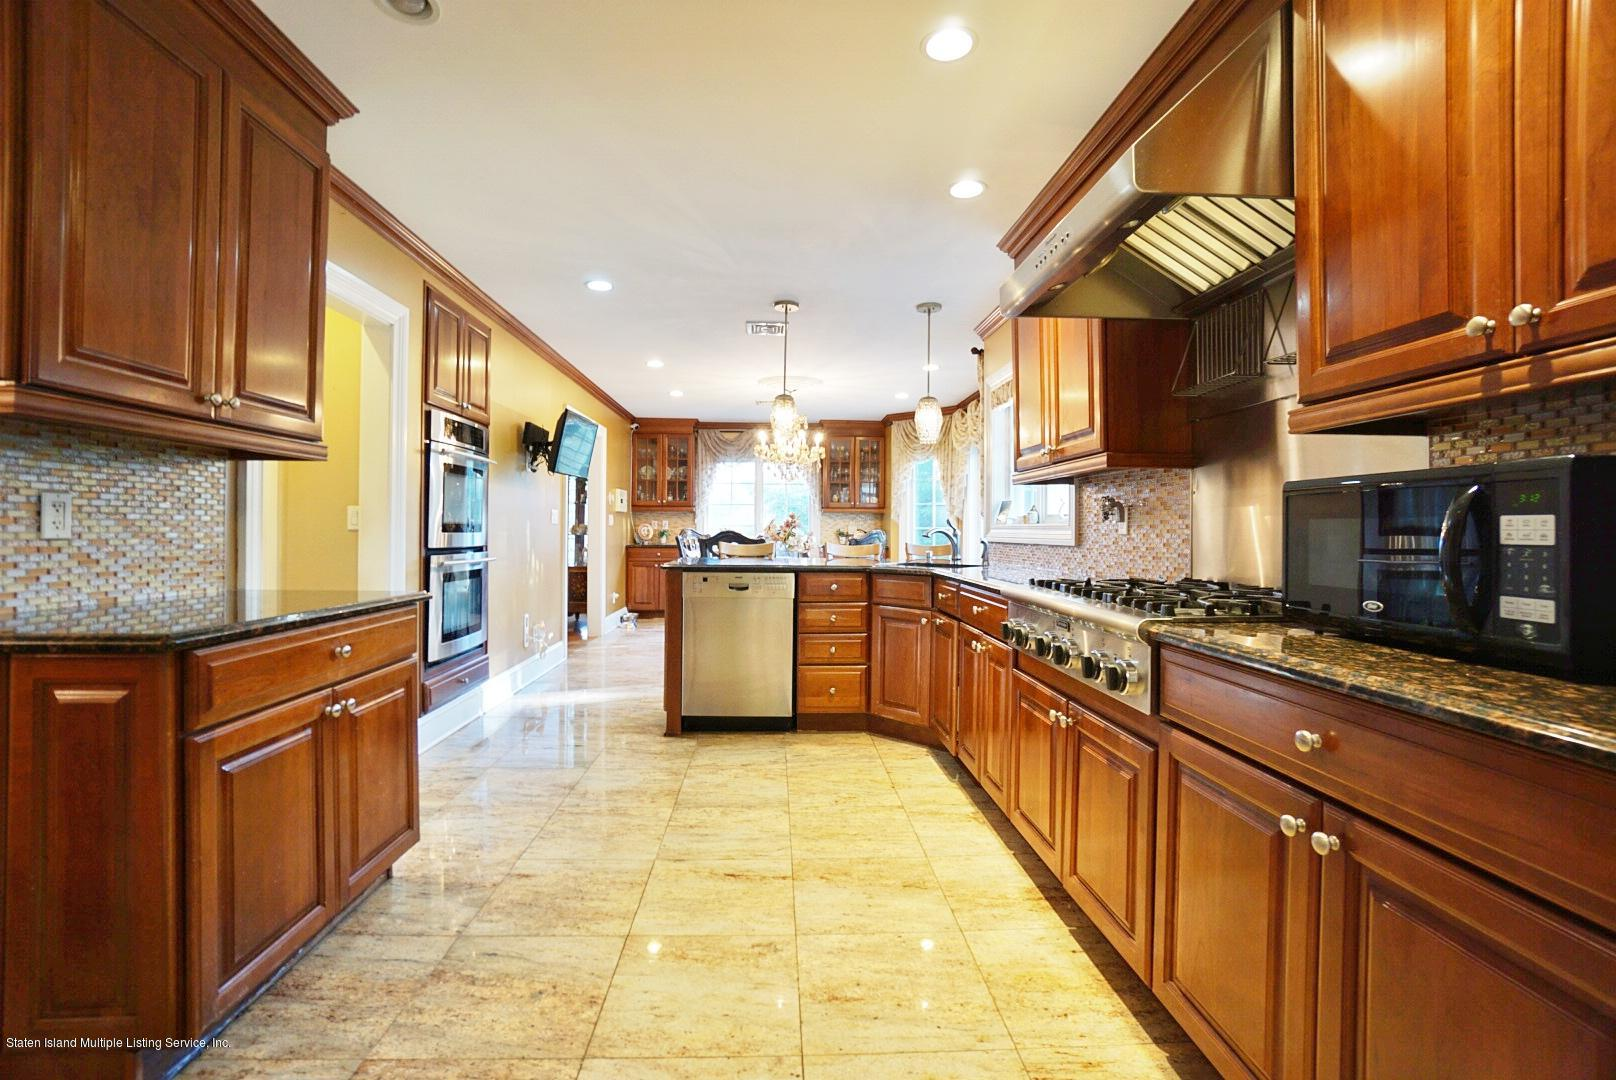 Two Family - Detached 70 Poillon Avenue  Staten Island, NY 10312, MLS-1135570-13